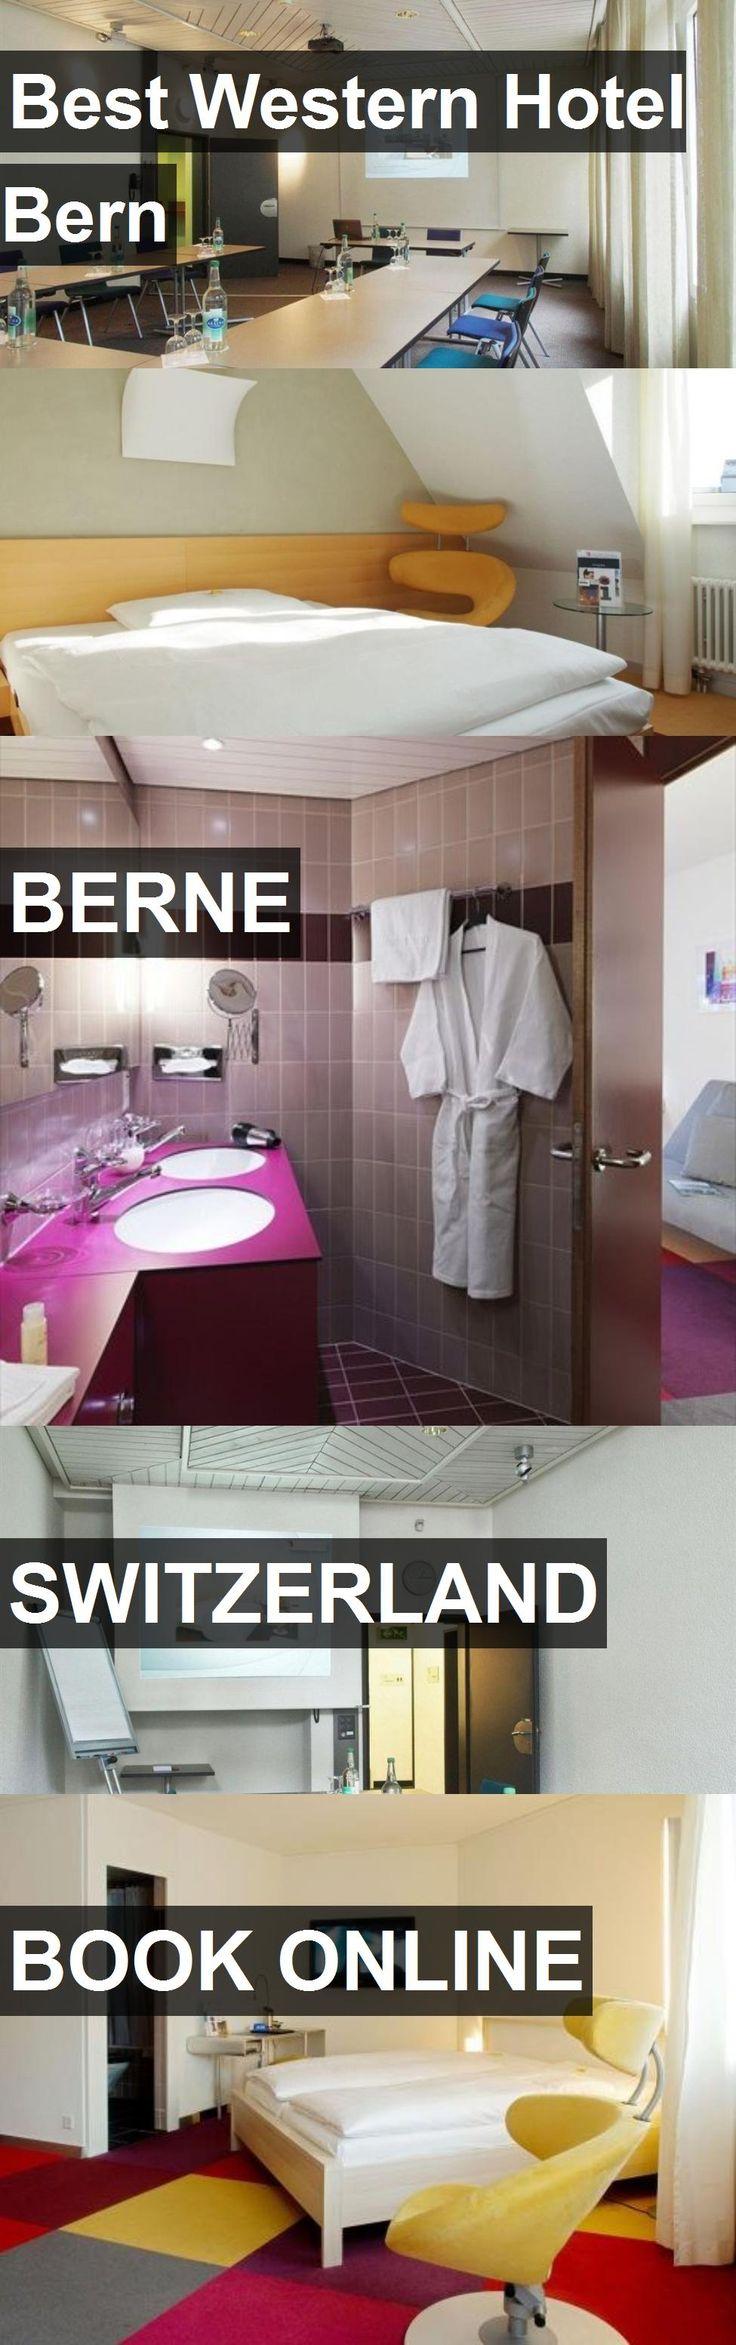 Hotel Best Western Hotel Bern in Berne, Switzerland. For more information, photos, reviews and best prices please follow the link. #Switzerland #Berne #BestWesternHotelBern #hotel #travel #vacation